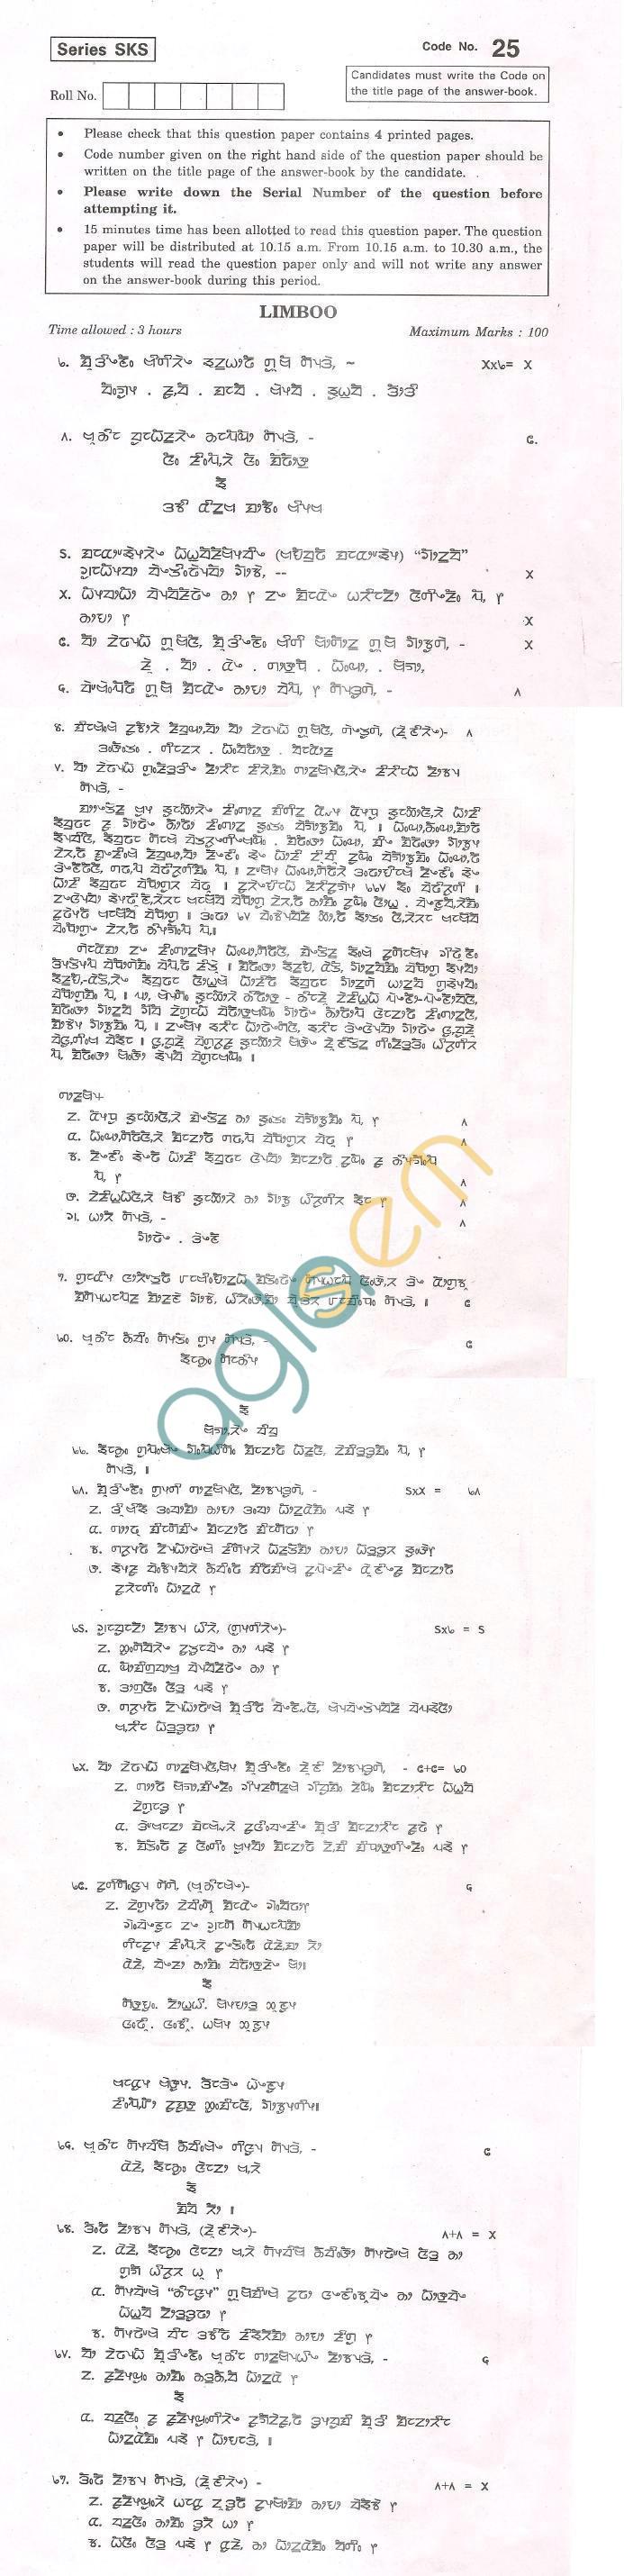 CBSE Board Exam 2013 Class XII Question Paper -Limboo